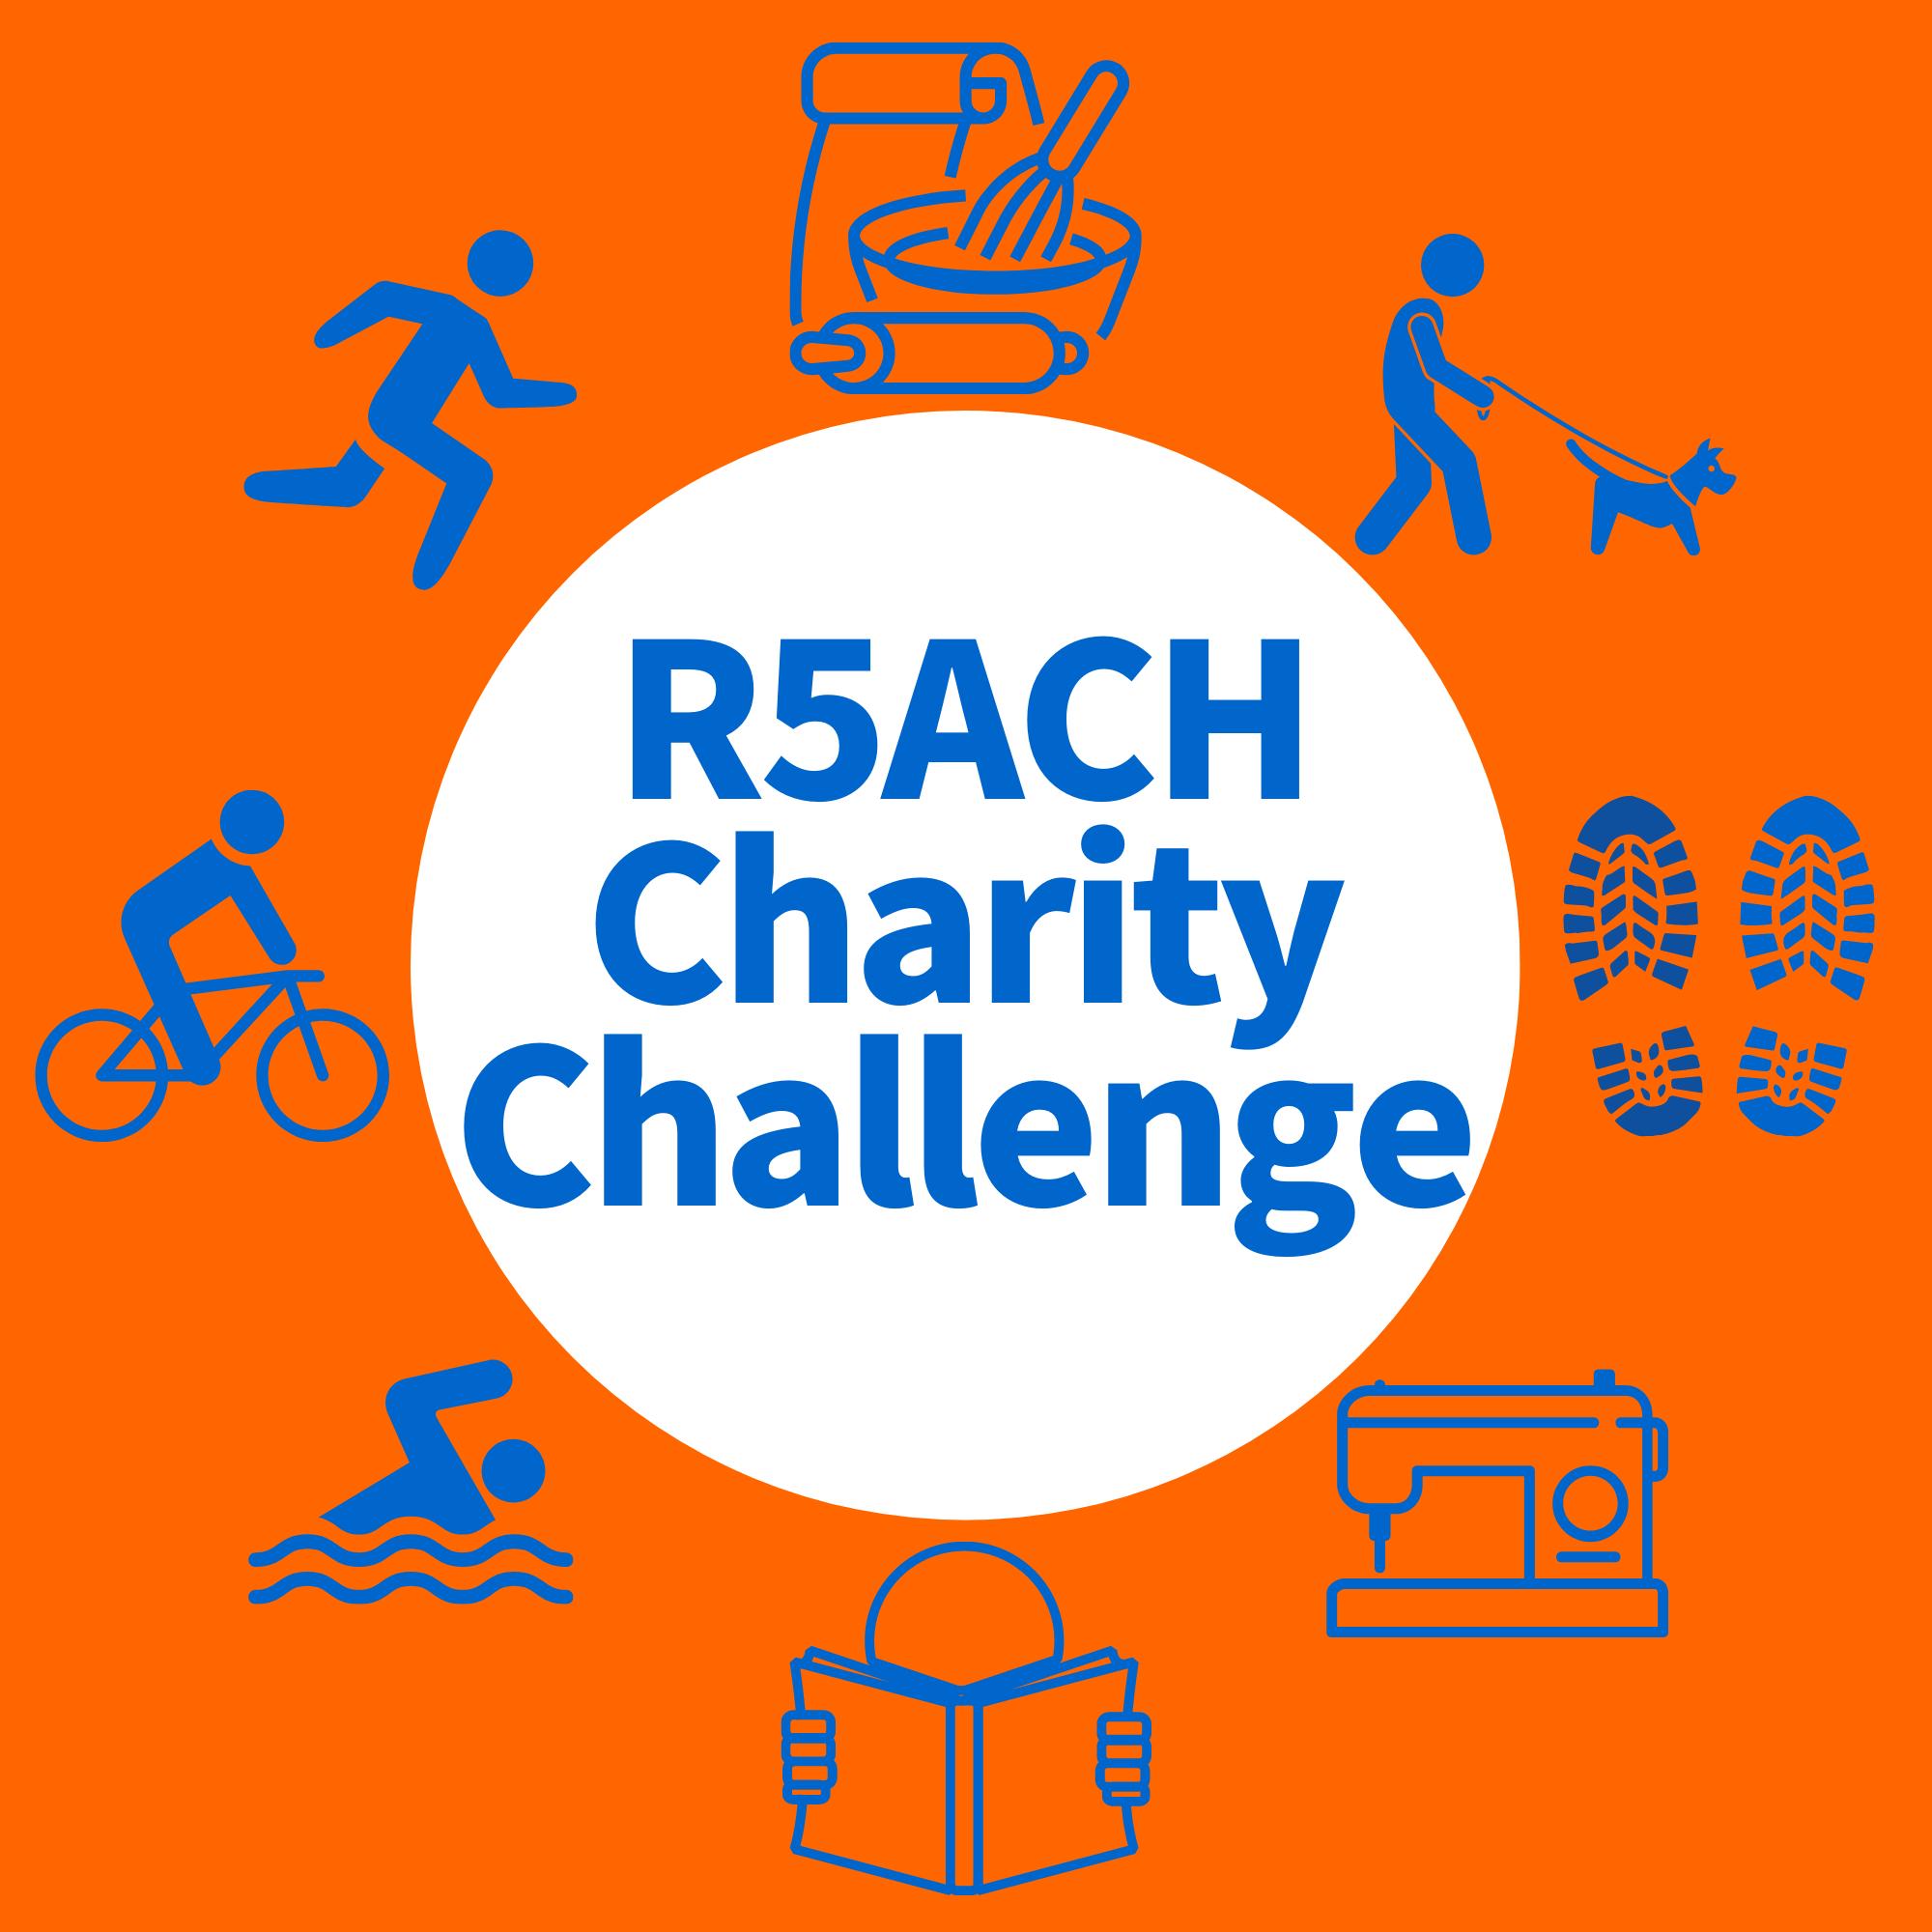 R5ACH Charity Challenge